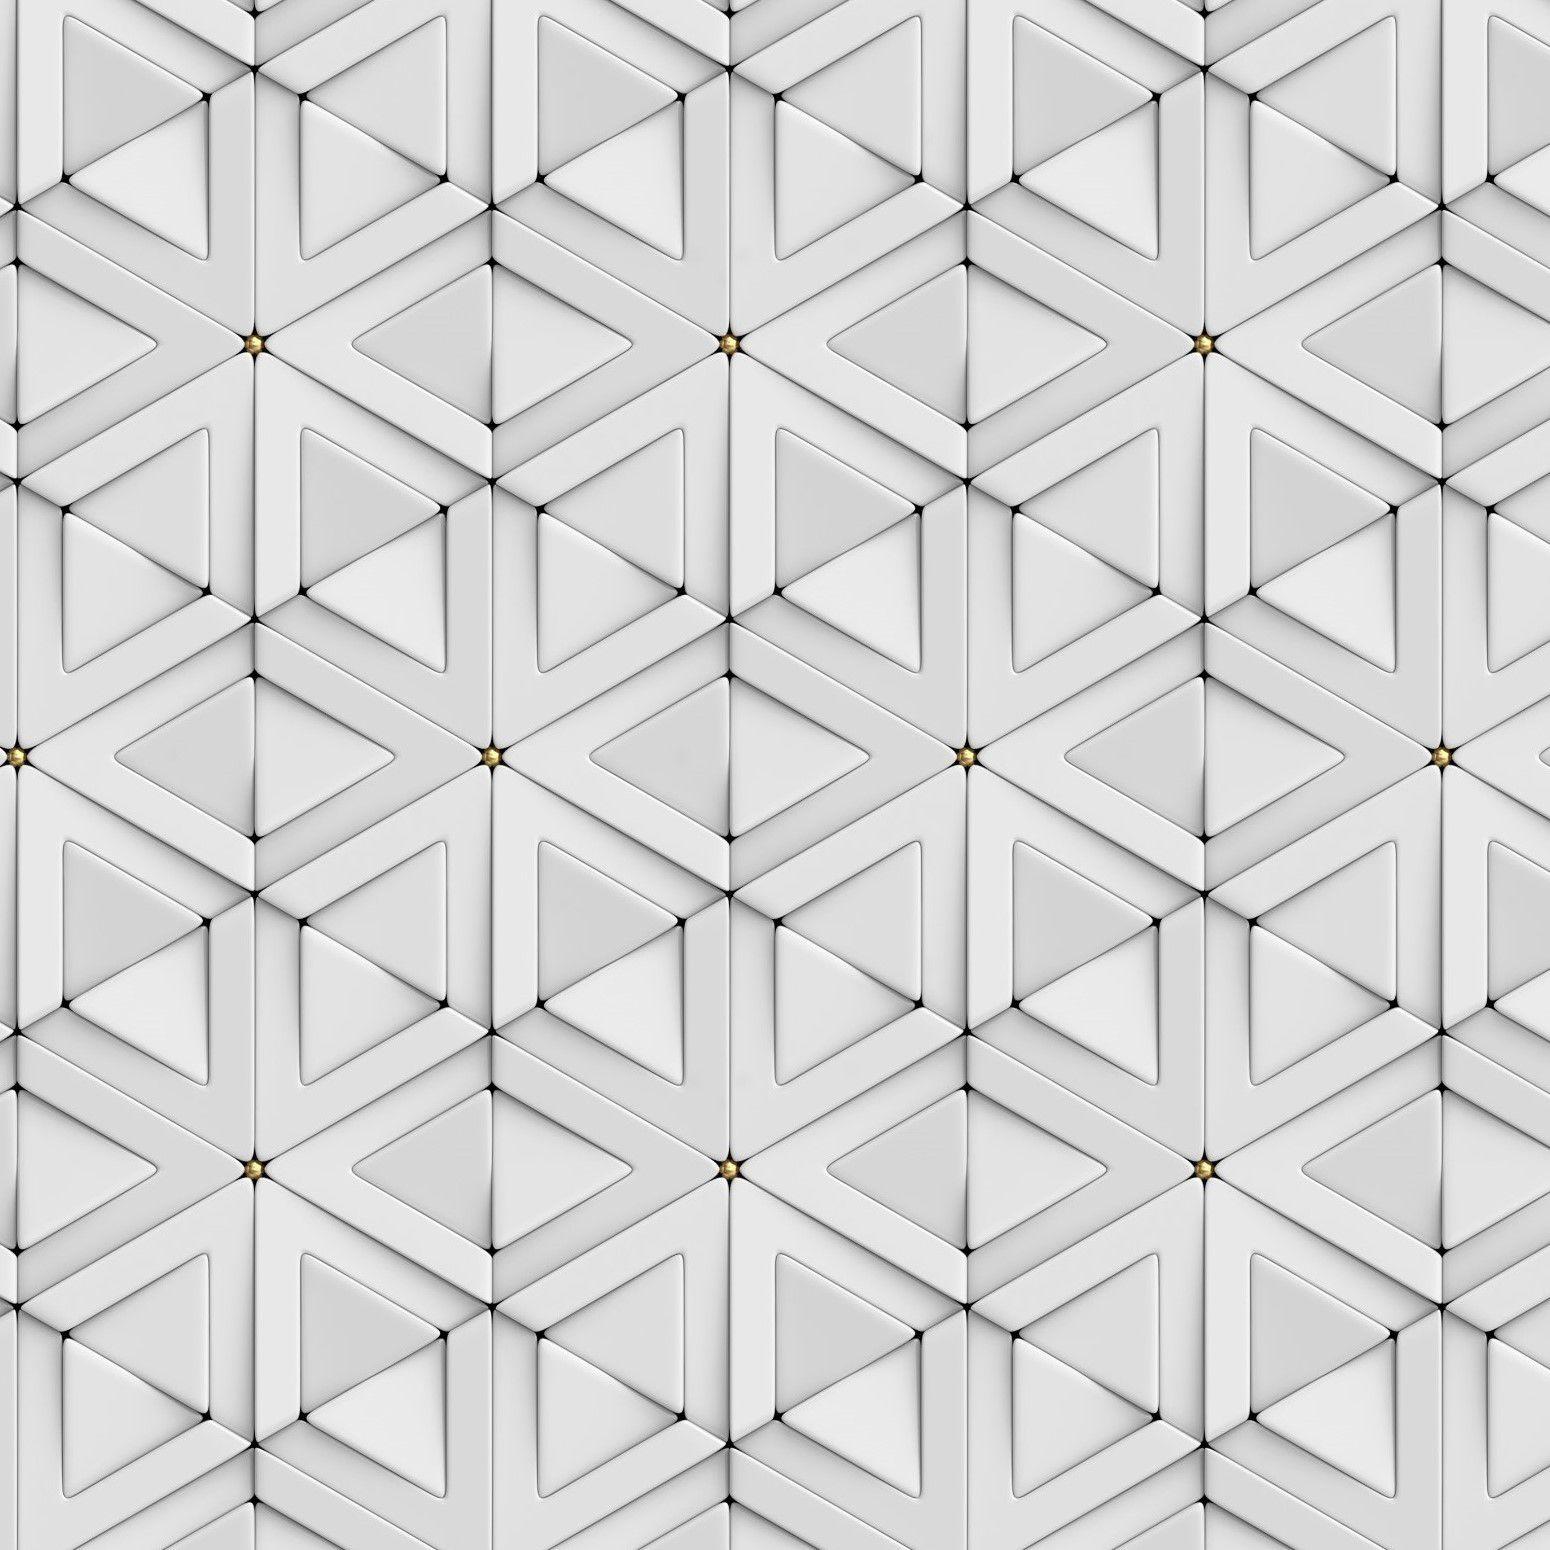 Papel de Parede Efeito 3D Lavável CO-708 - Cole Aí